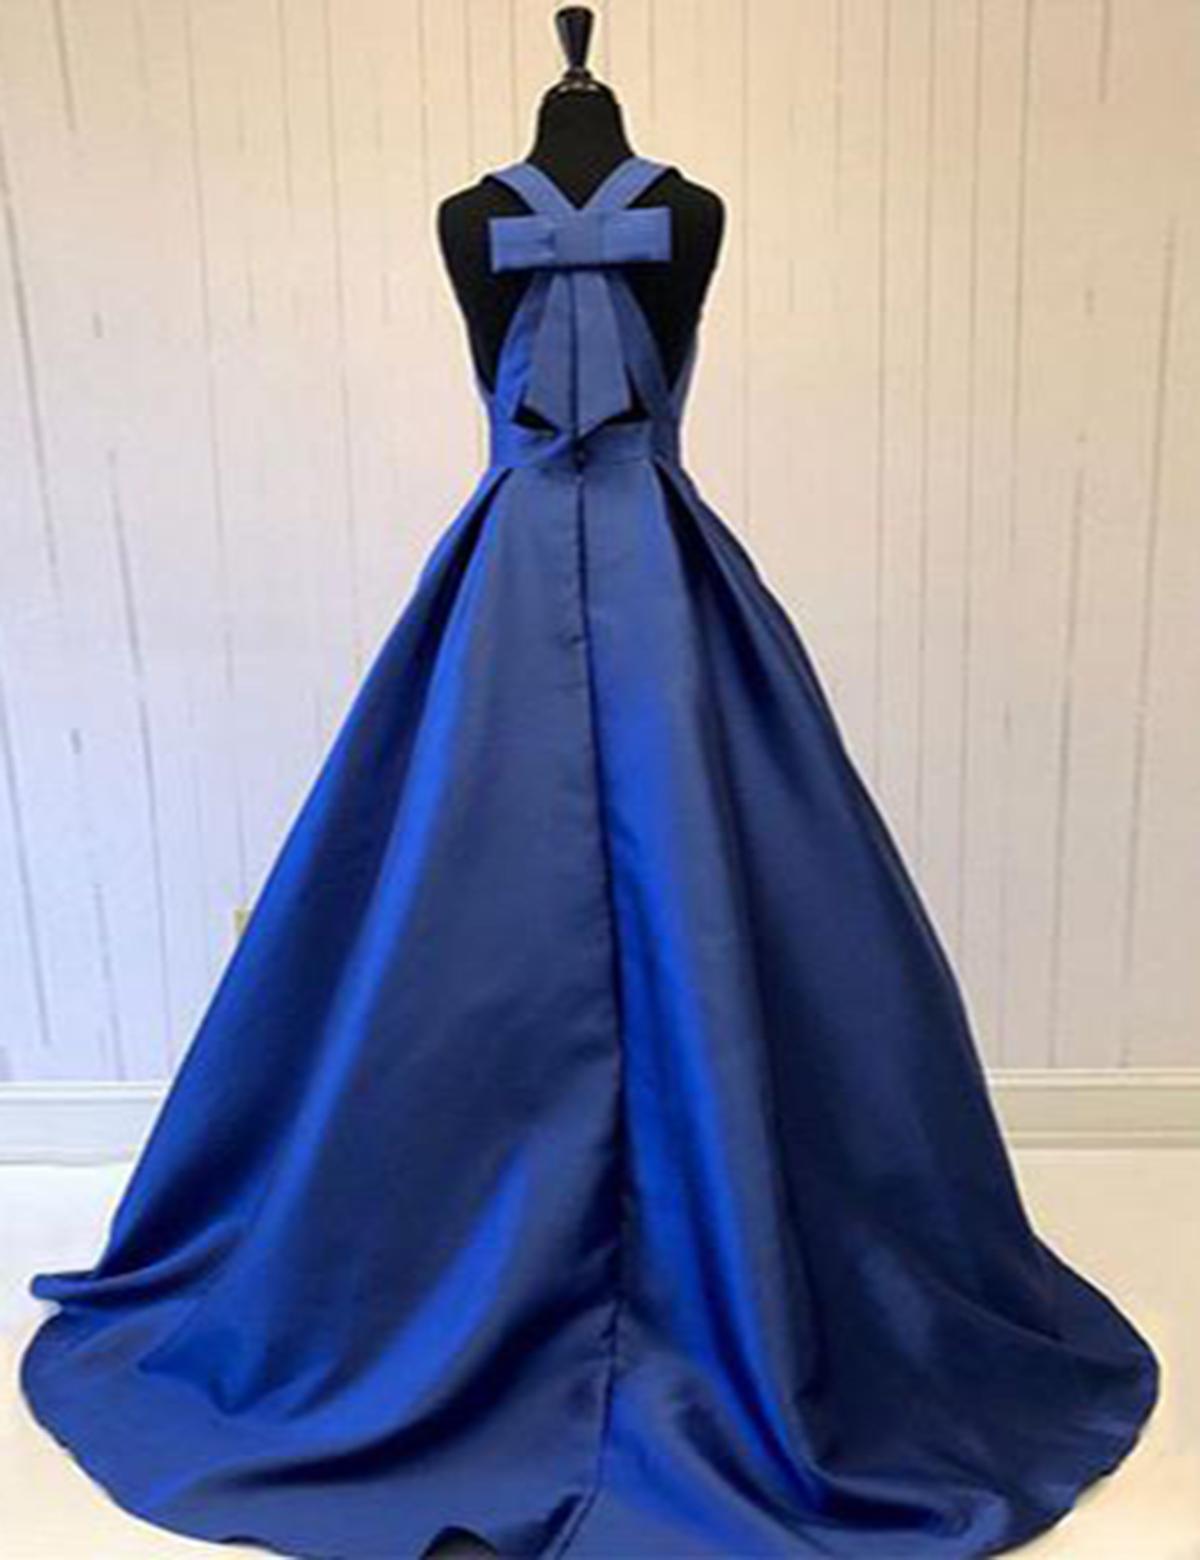 35e91b696d Royal blue deep V neck long open back bowknot sweet 16 prom dress -  Thumbnail 1 ...